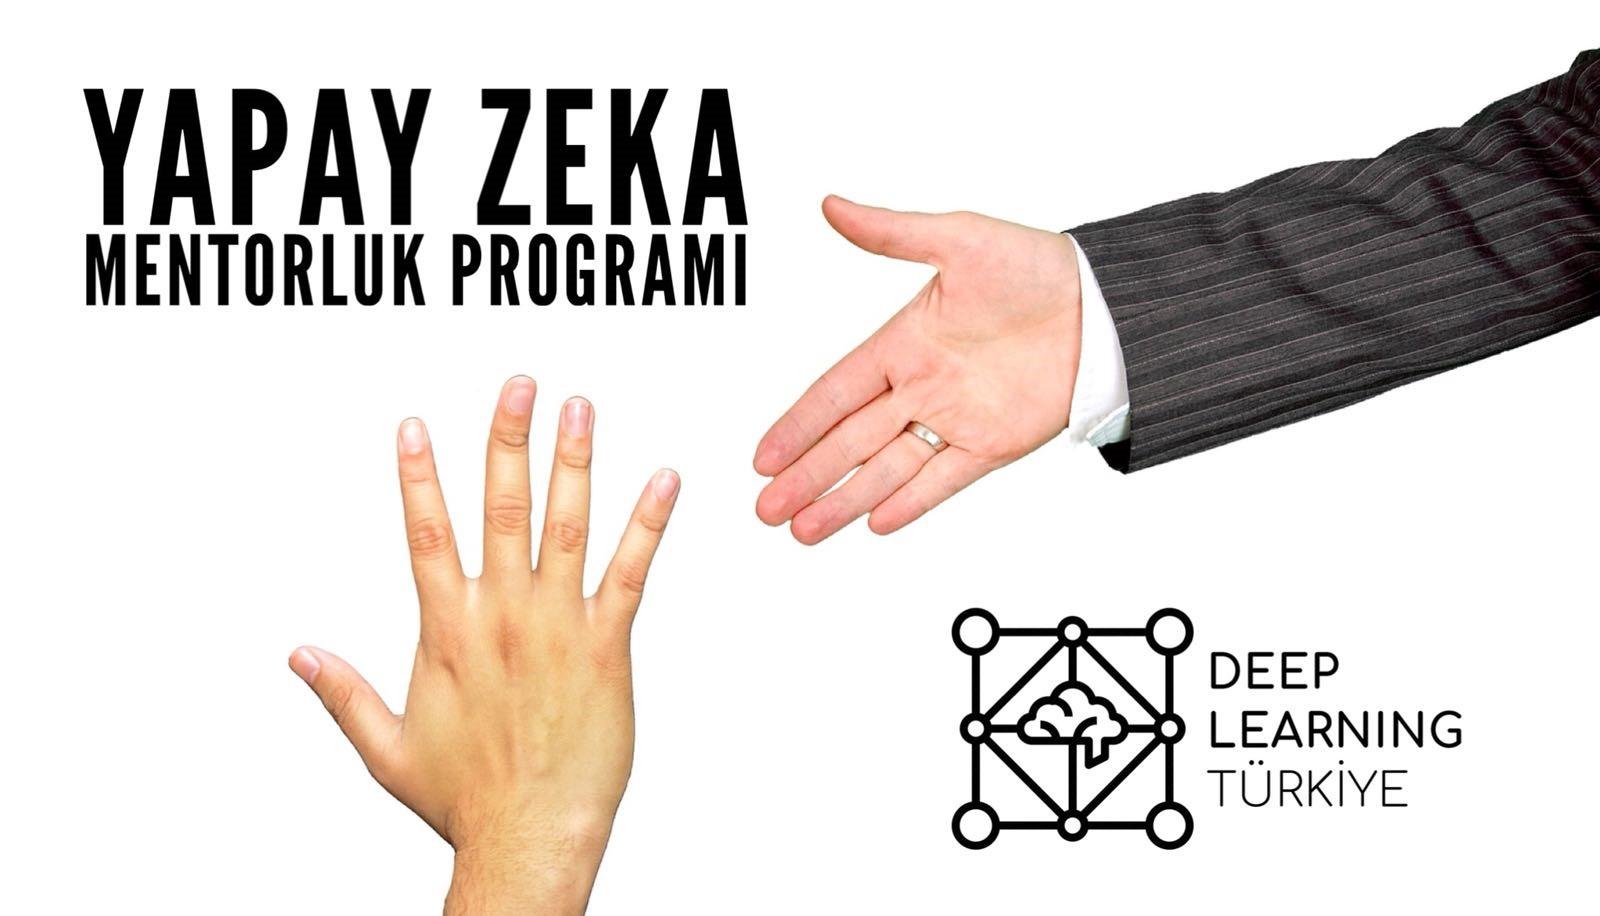 Yapay_Zeka_Mentorluk_Programi